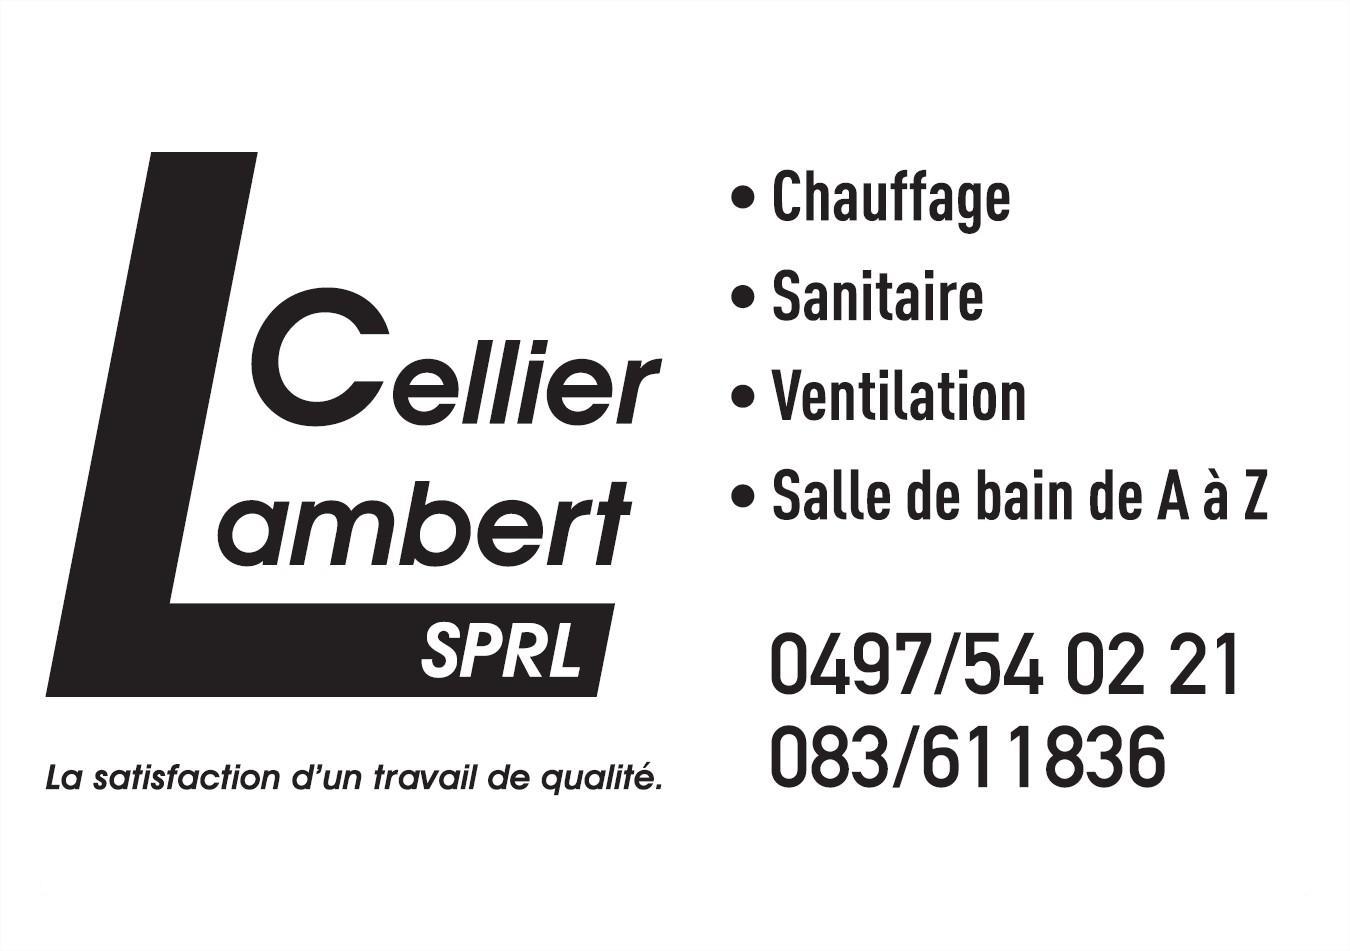 cellier_lambert_sprl_NEW